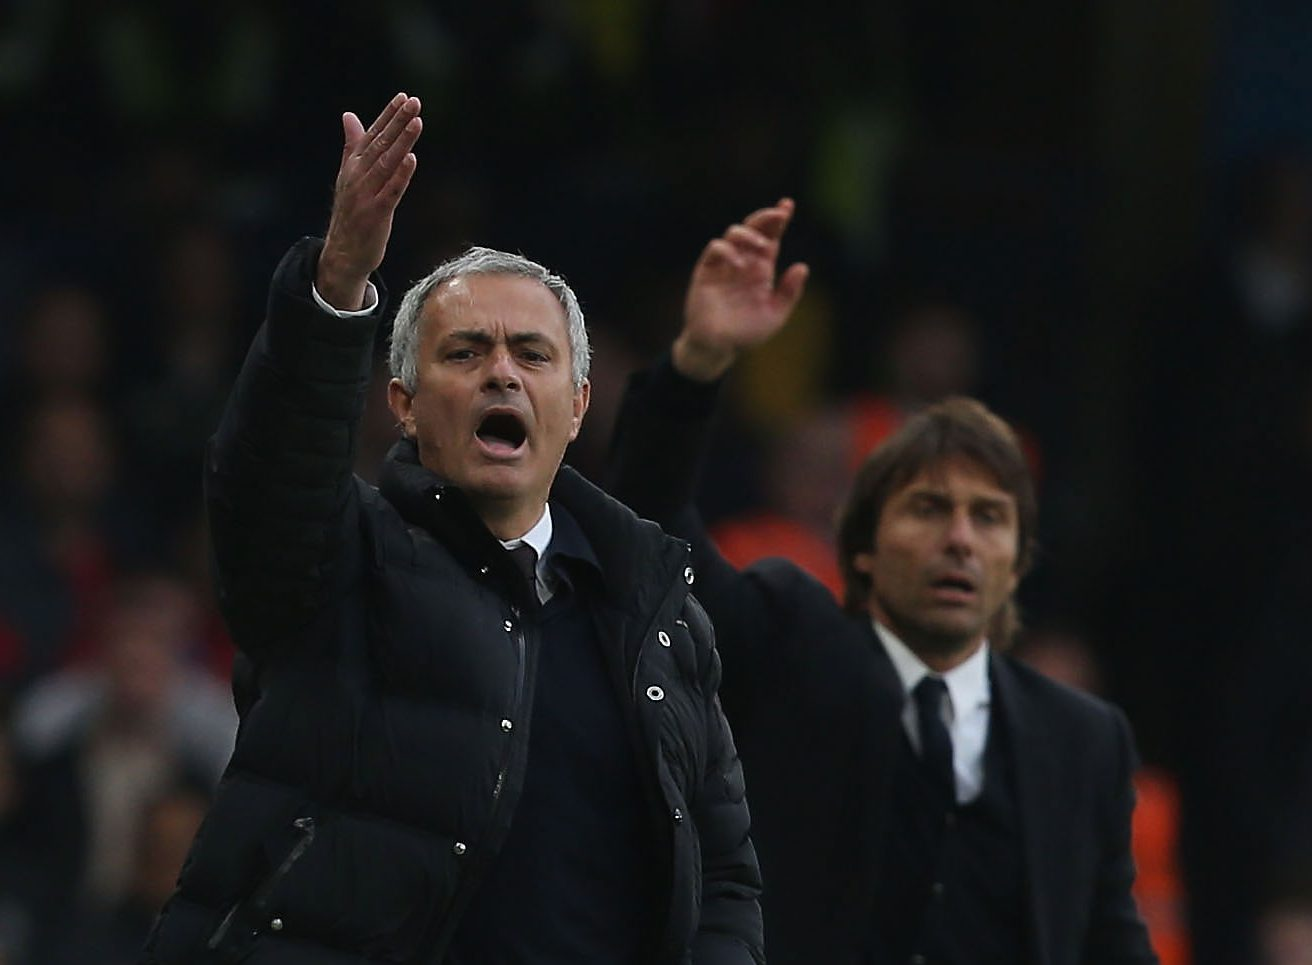 Manchester United boss Jose Mourinho jealous of former club Chelsea, says Gary Neville